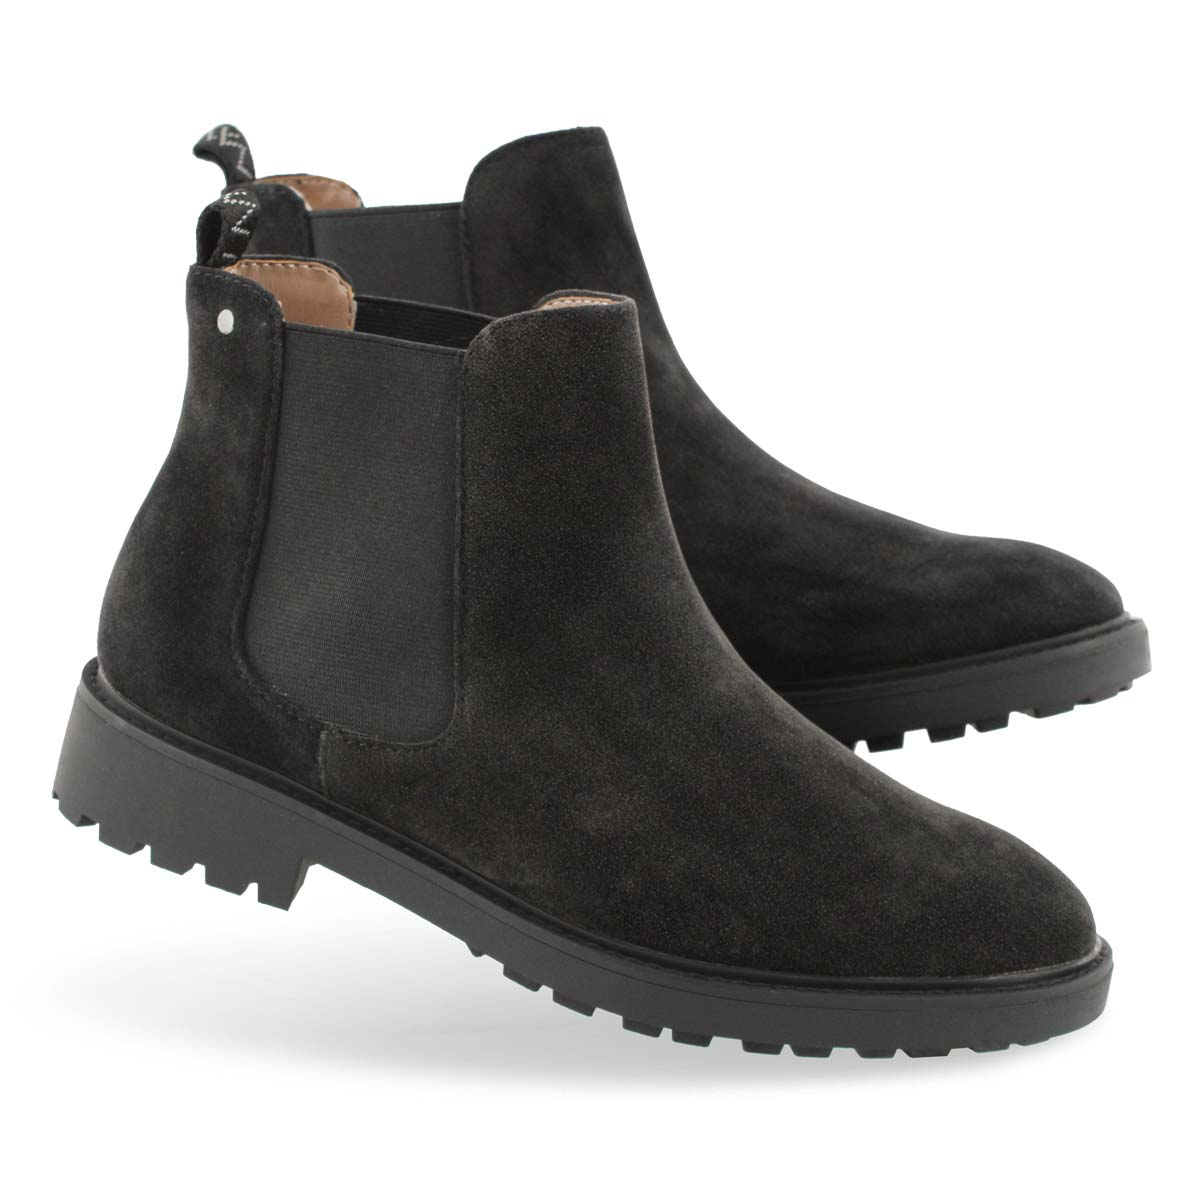 Lds Tokio black vegan chelsea boot